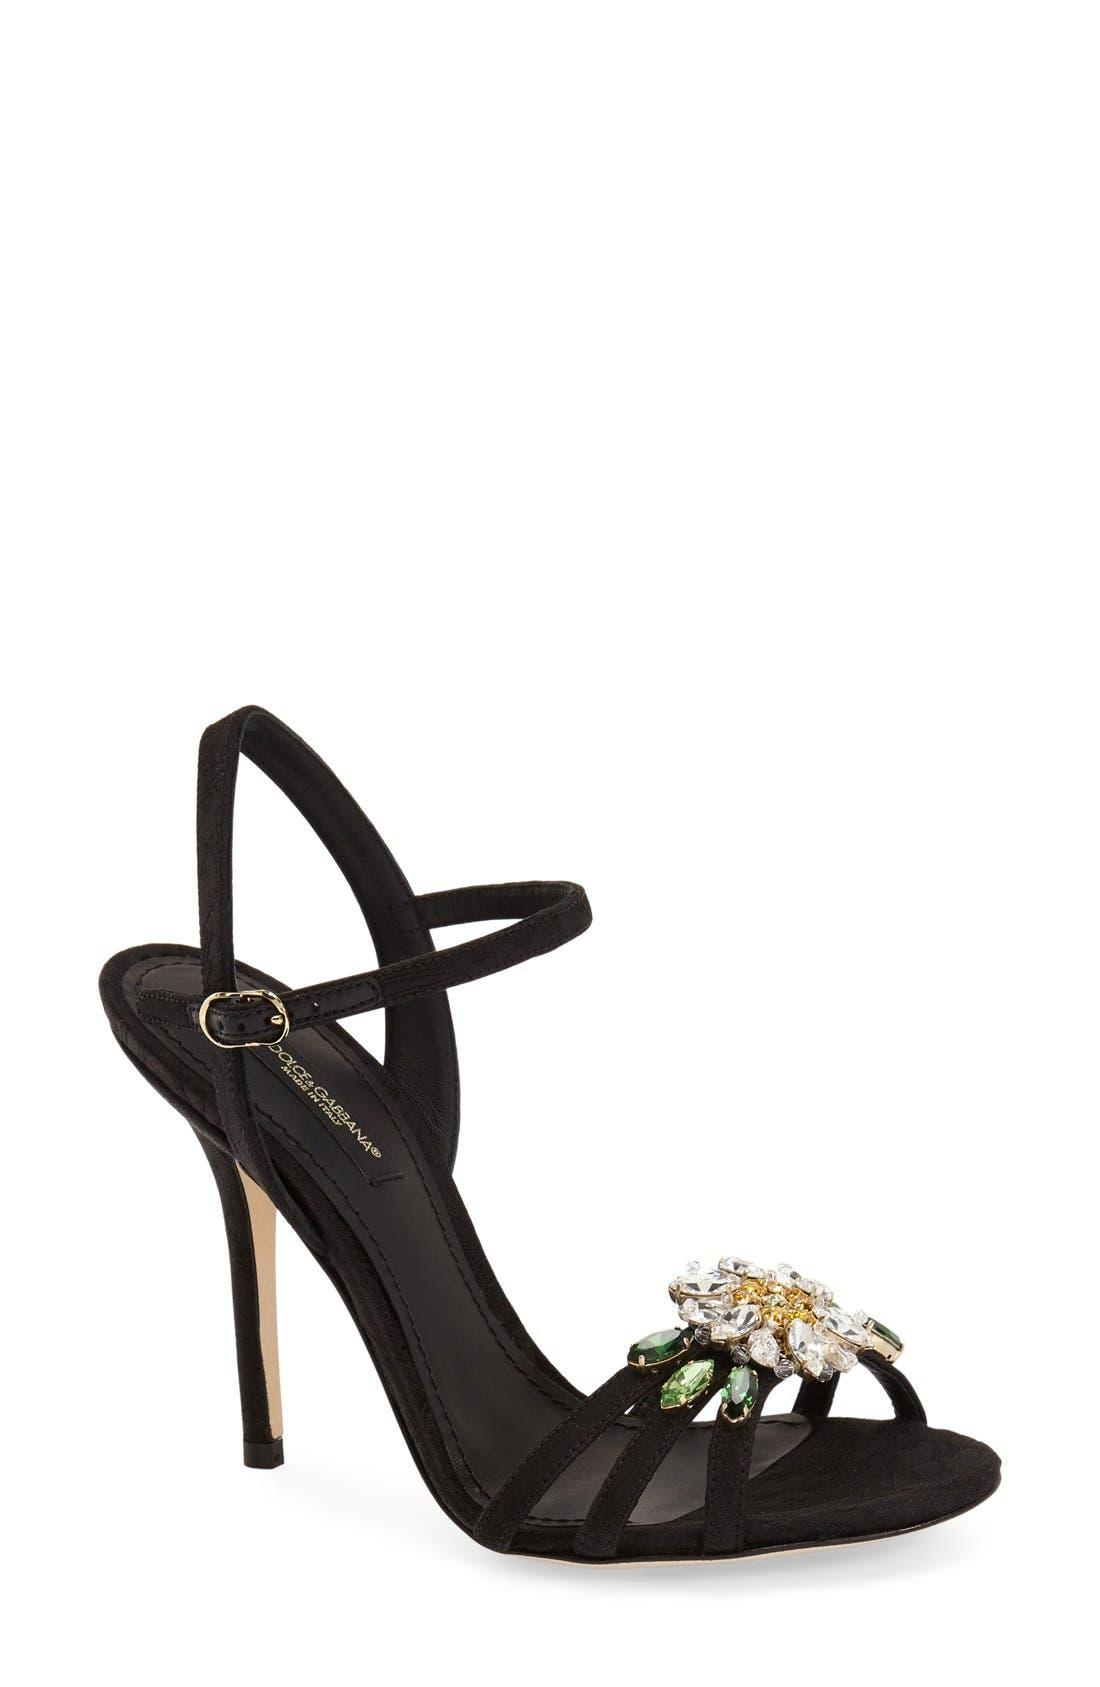 DOLCE&GABBANA, Jeweled Strappy Sandal, Main thumbnail 1, color, 001